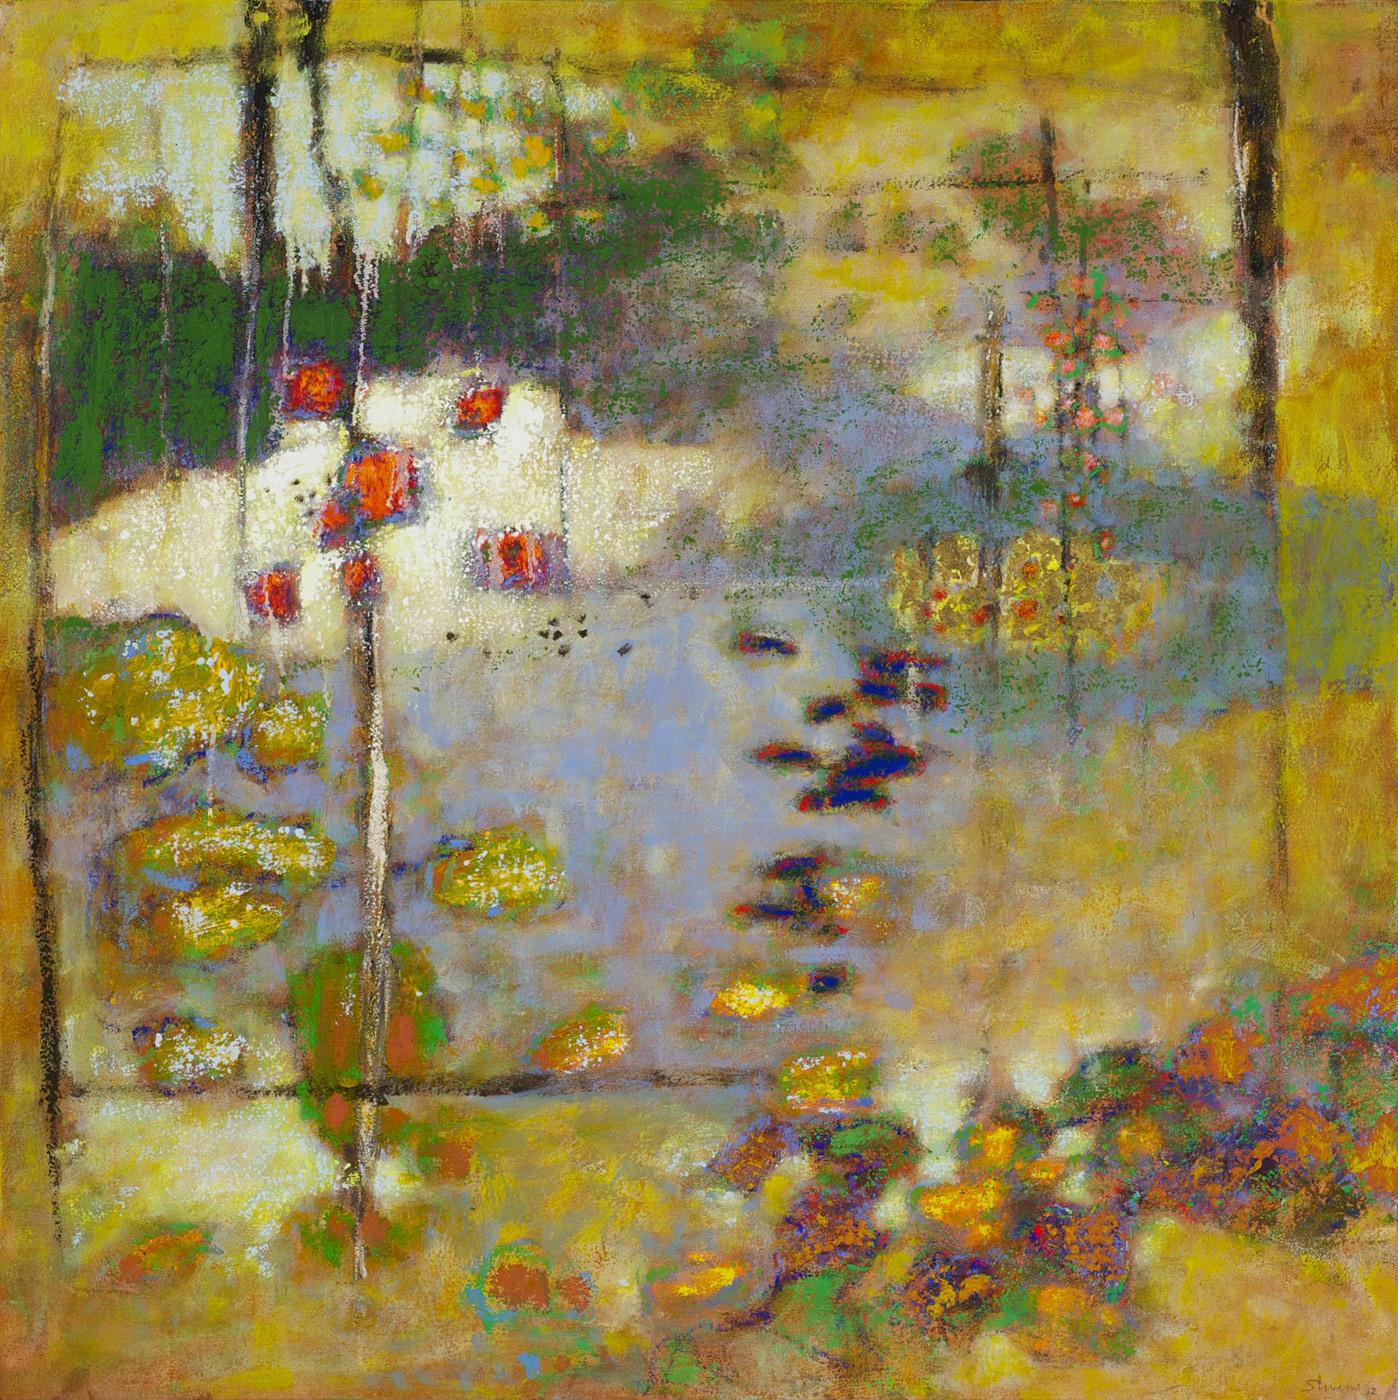 "At the Dreams Door   | oil on canvas | 36 x 36"" | 2012"